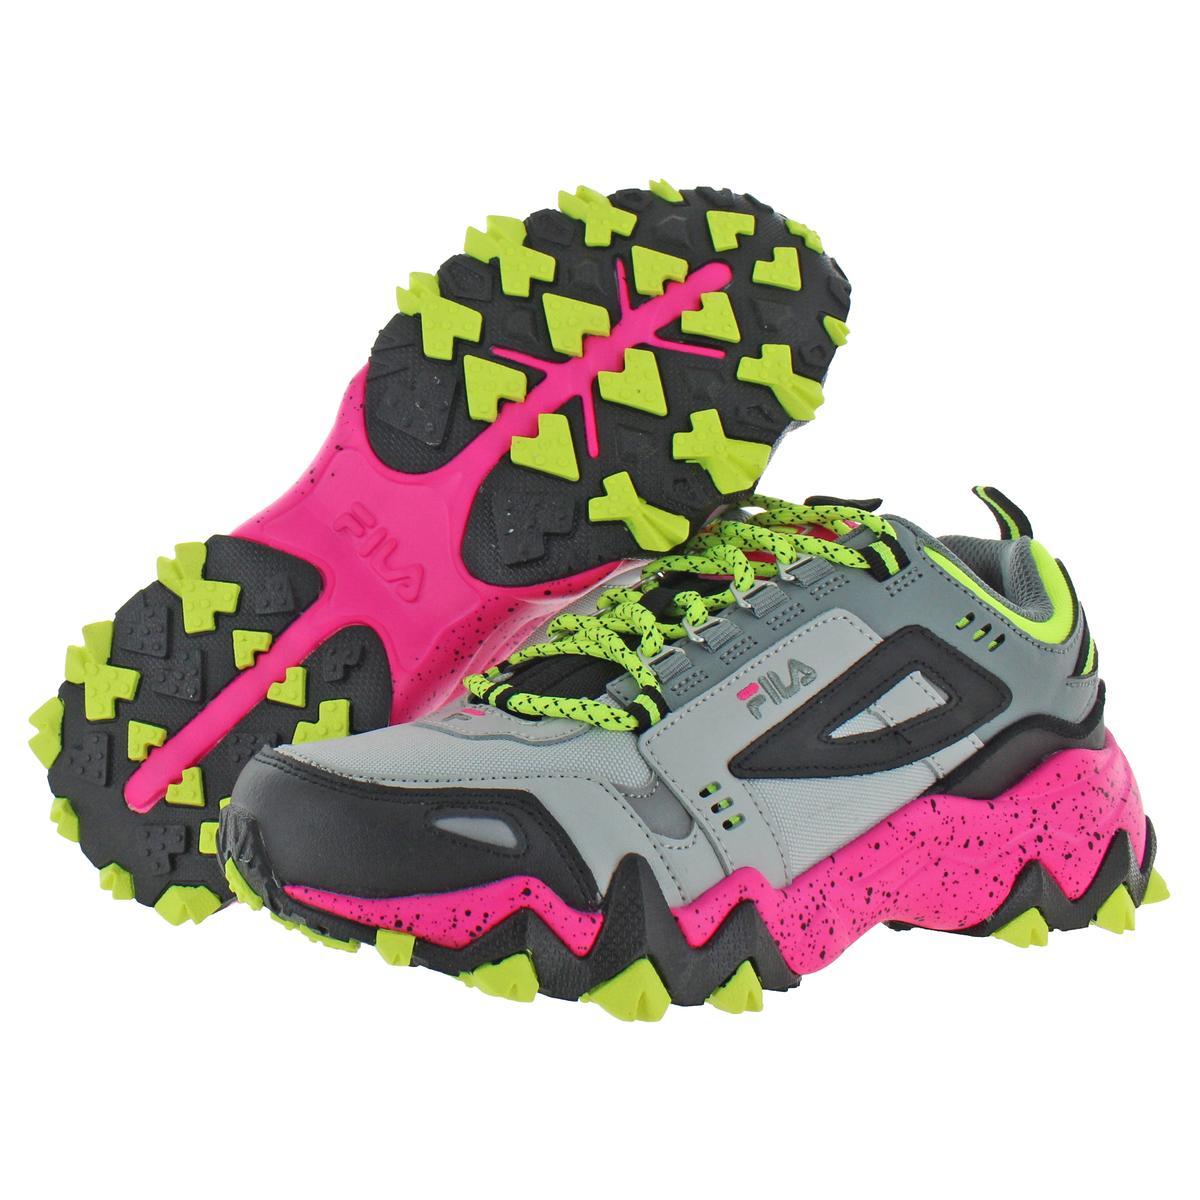 thumbnail 5 - Fila Women's Oakmont Leather Retro-Inspired Chunky Athletic Hiking Trail Sneaker